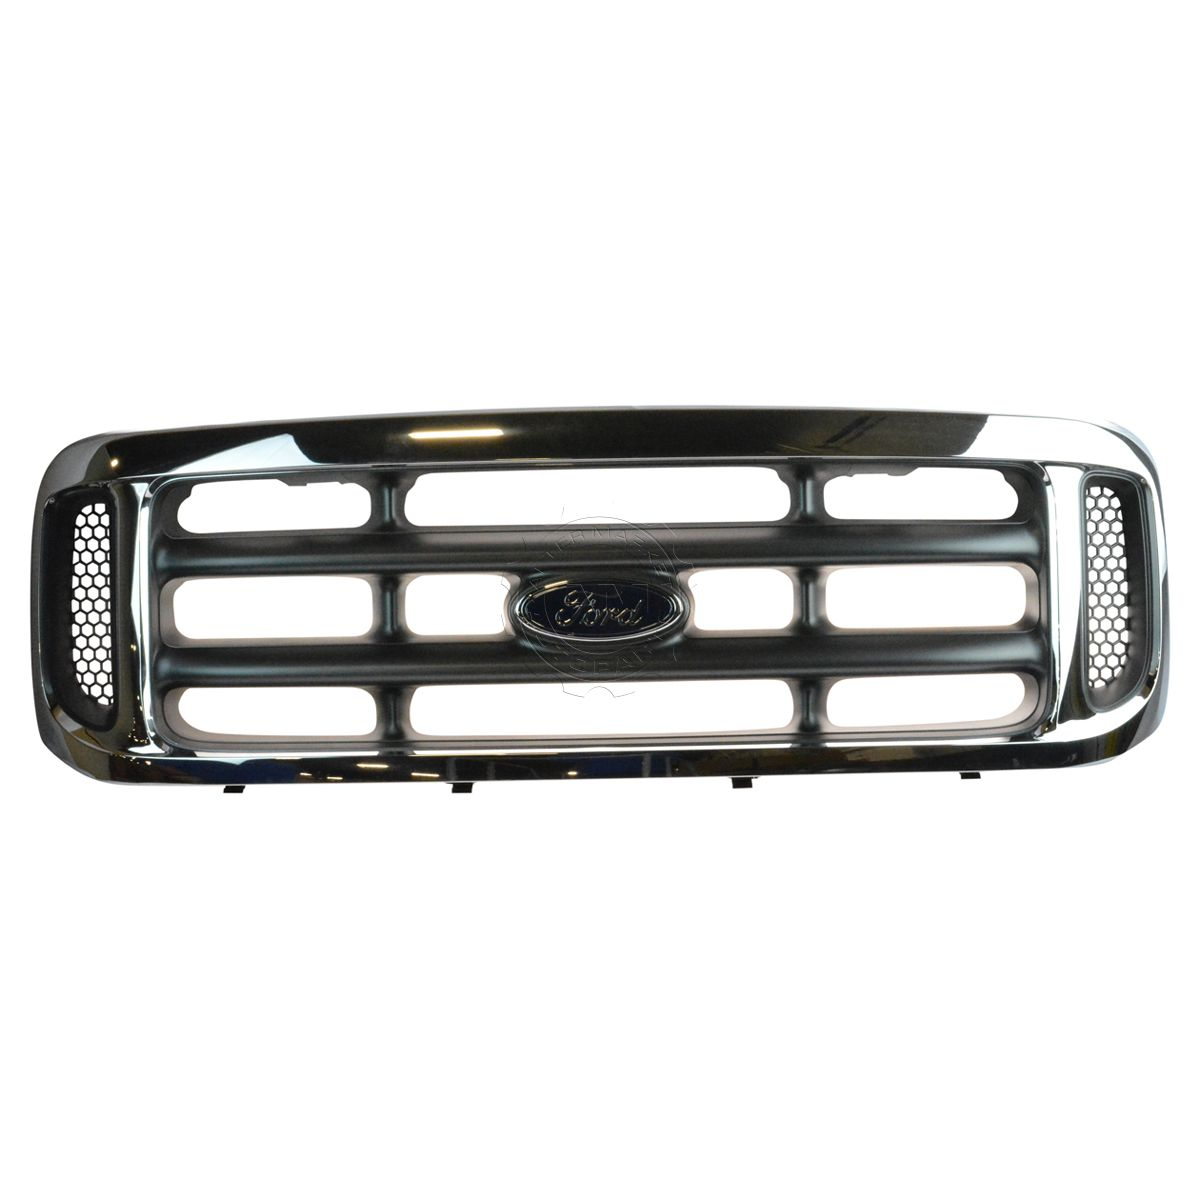 Grille Platinum: OEM 1C3Z-8200-BAA Chrome & Platinum Grille With Emblem For